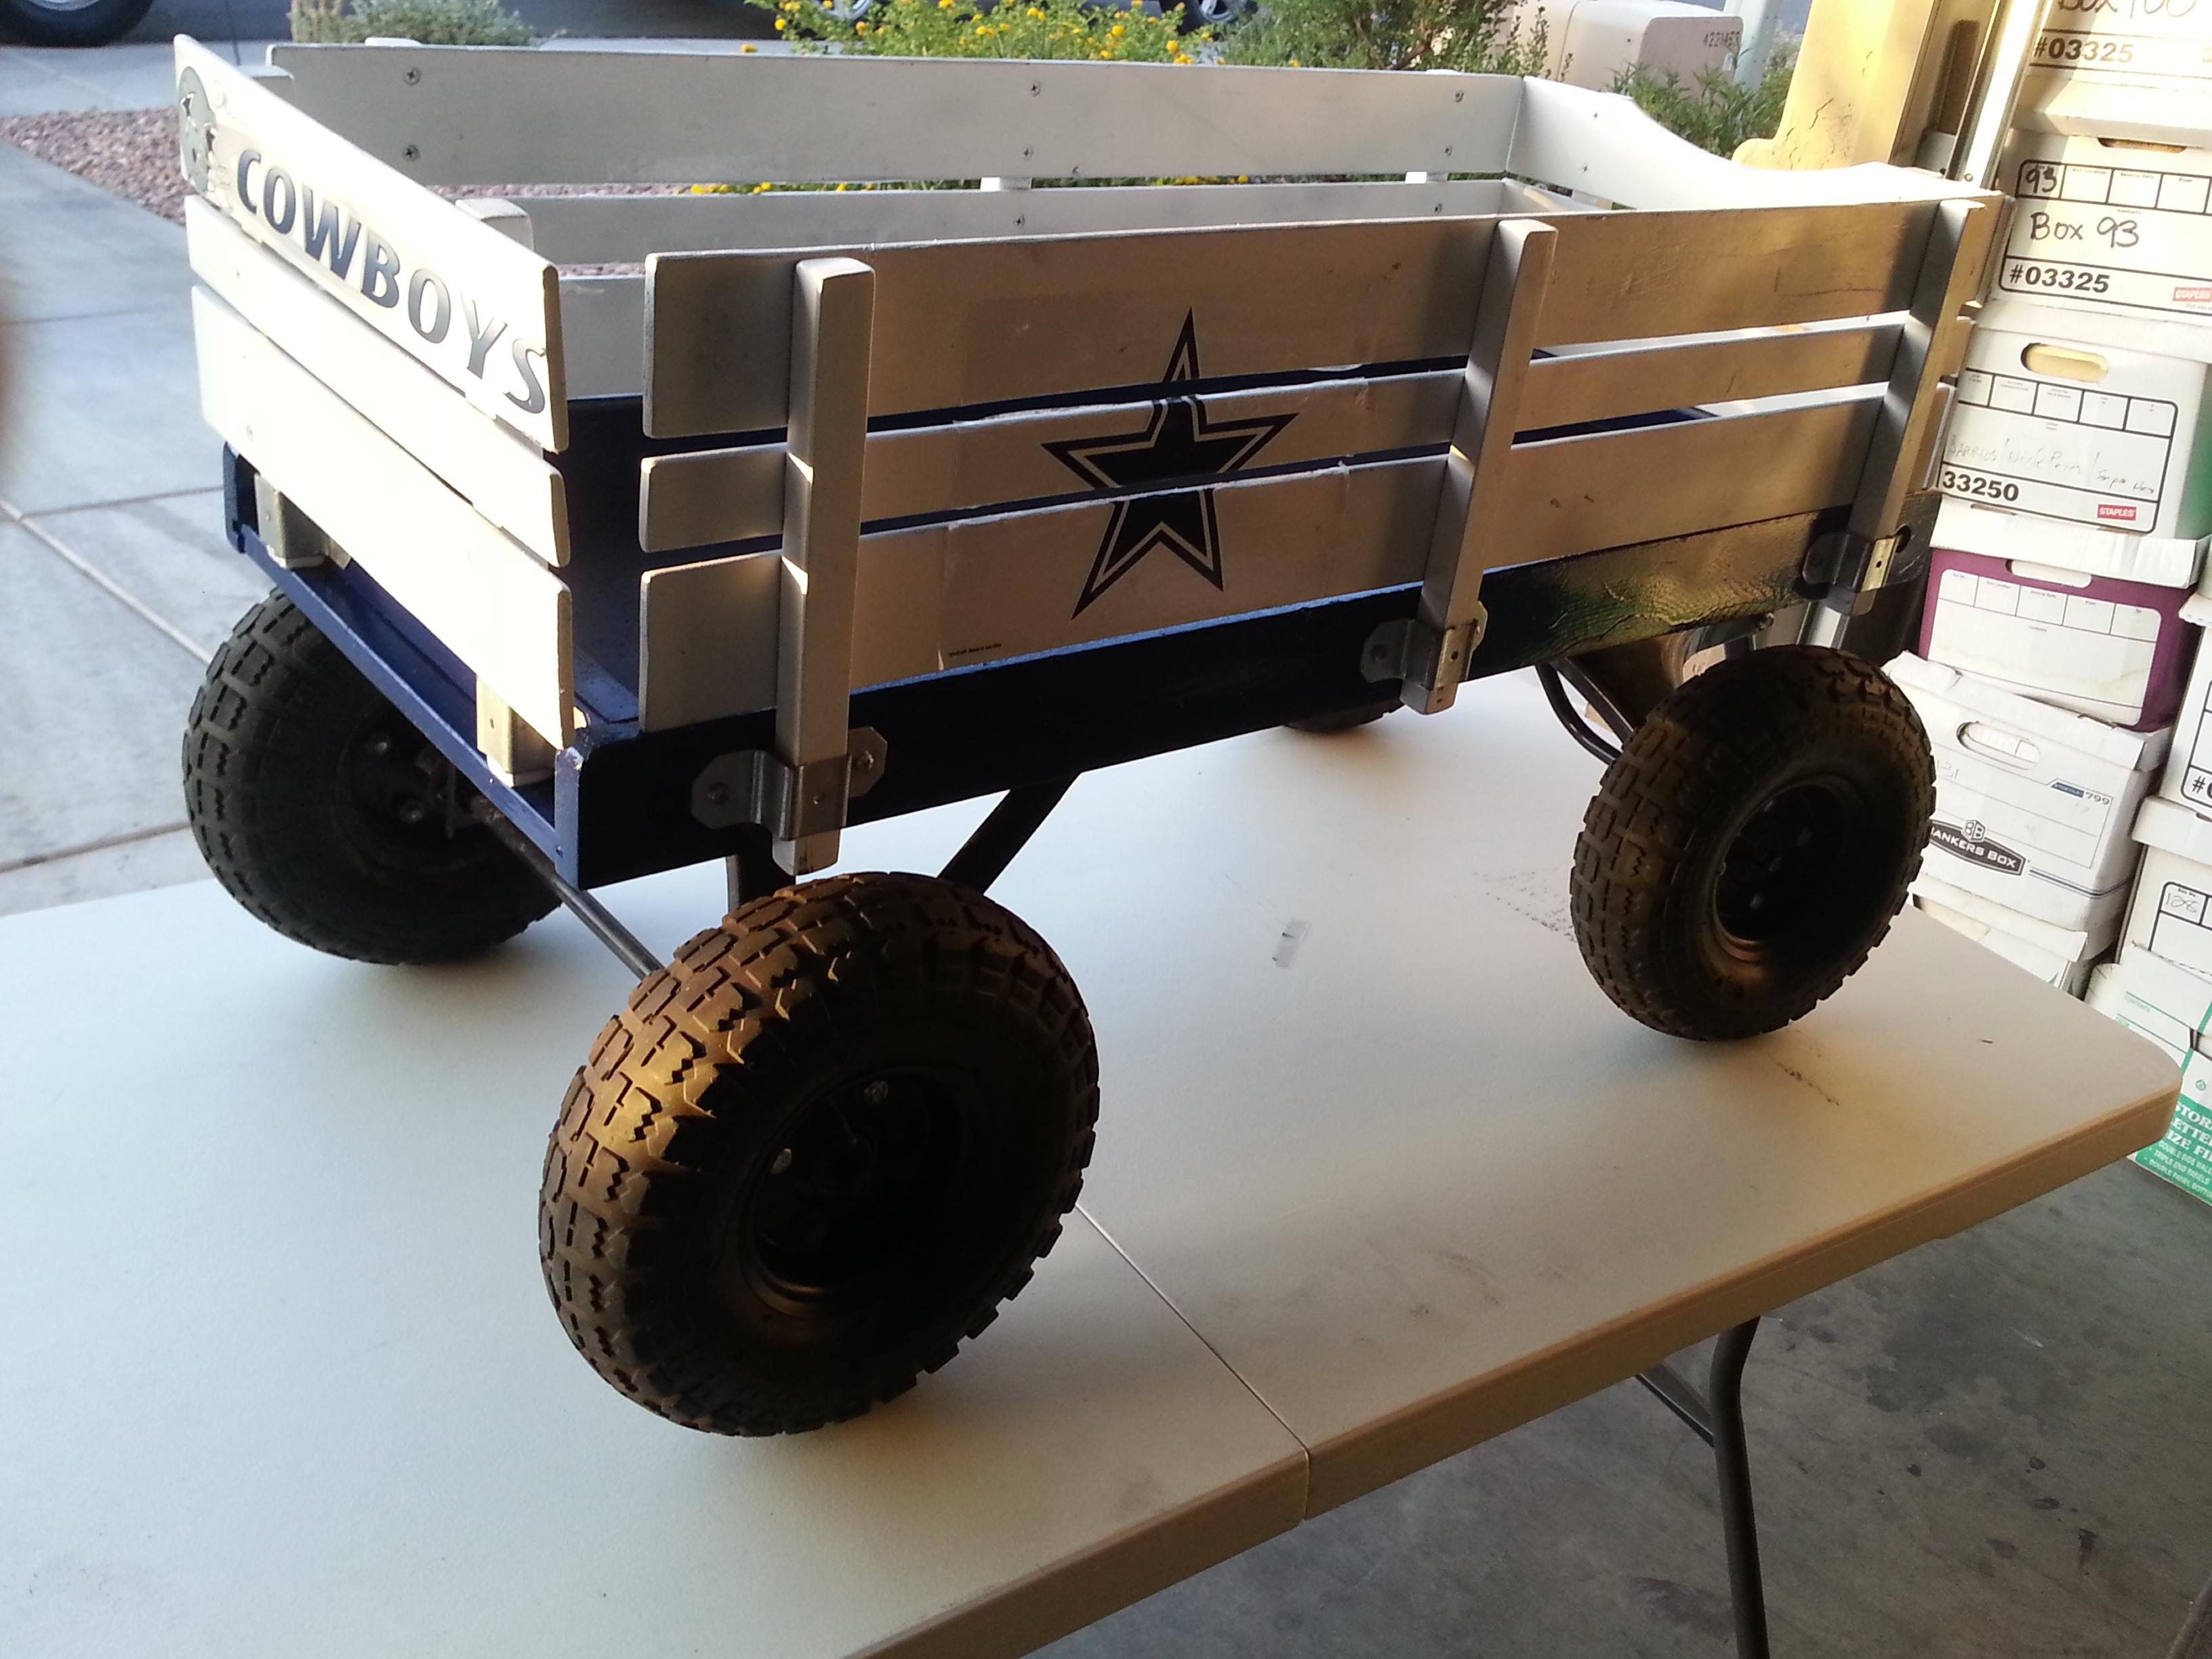 Cowboys wagon